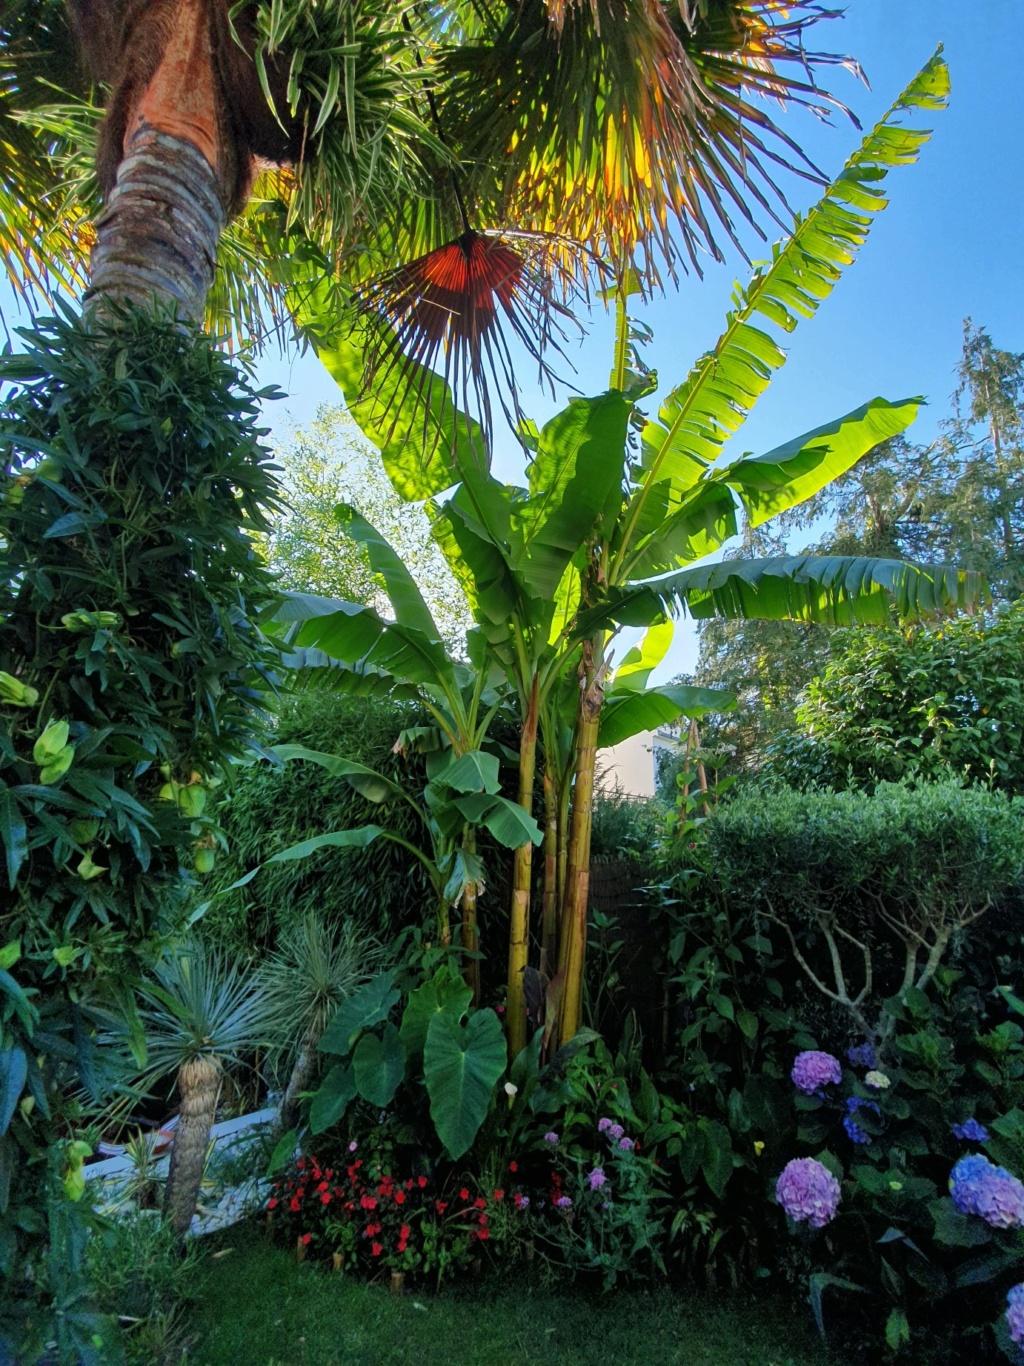 Mon (tout) petit jardin en mode tropical - Page 14 20190812